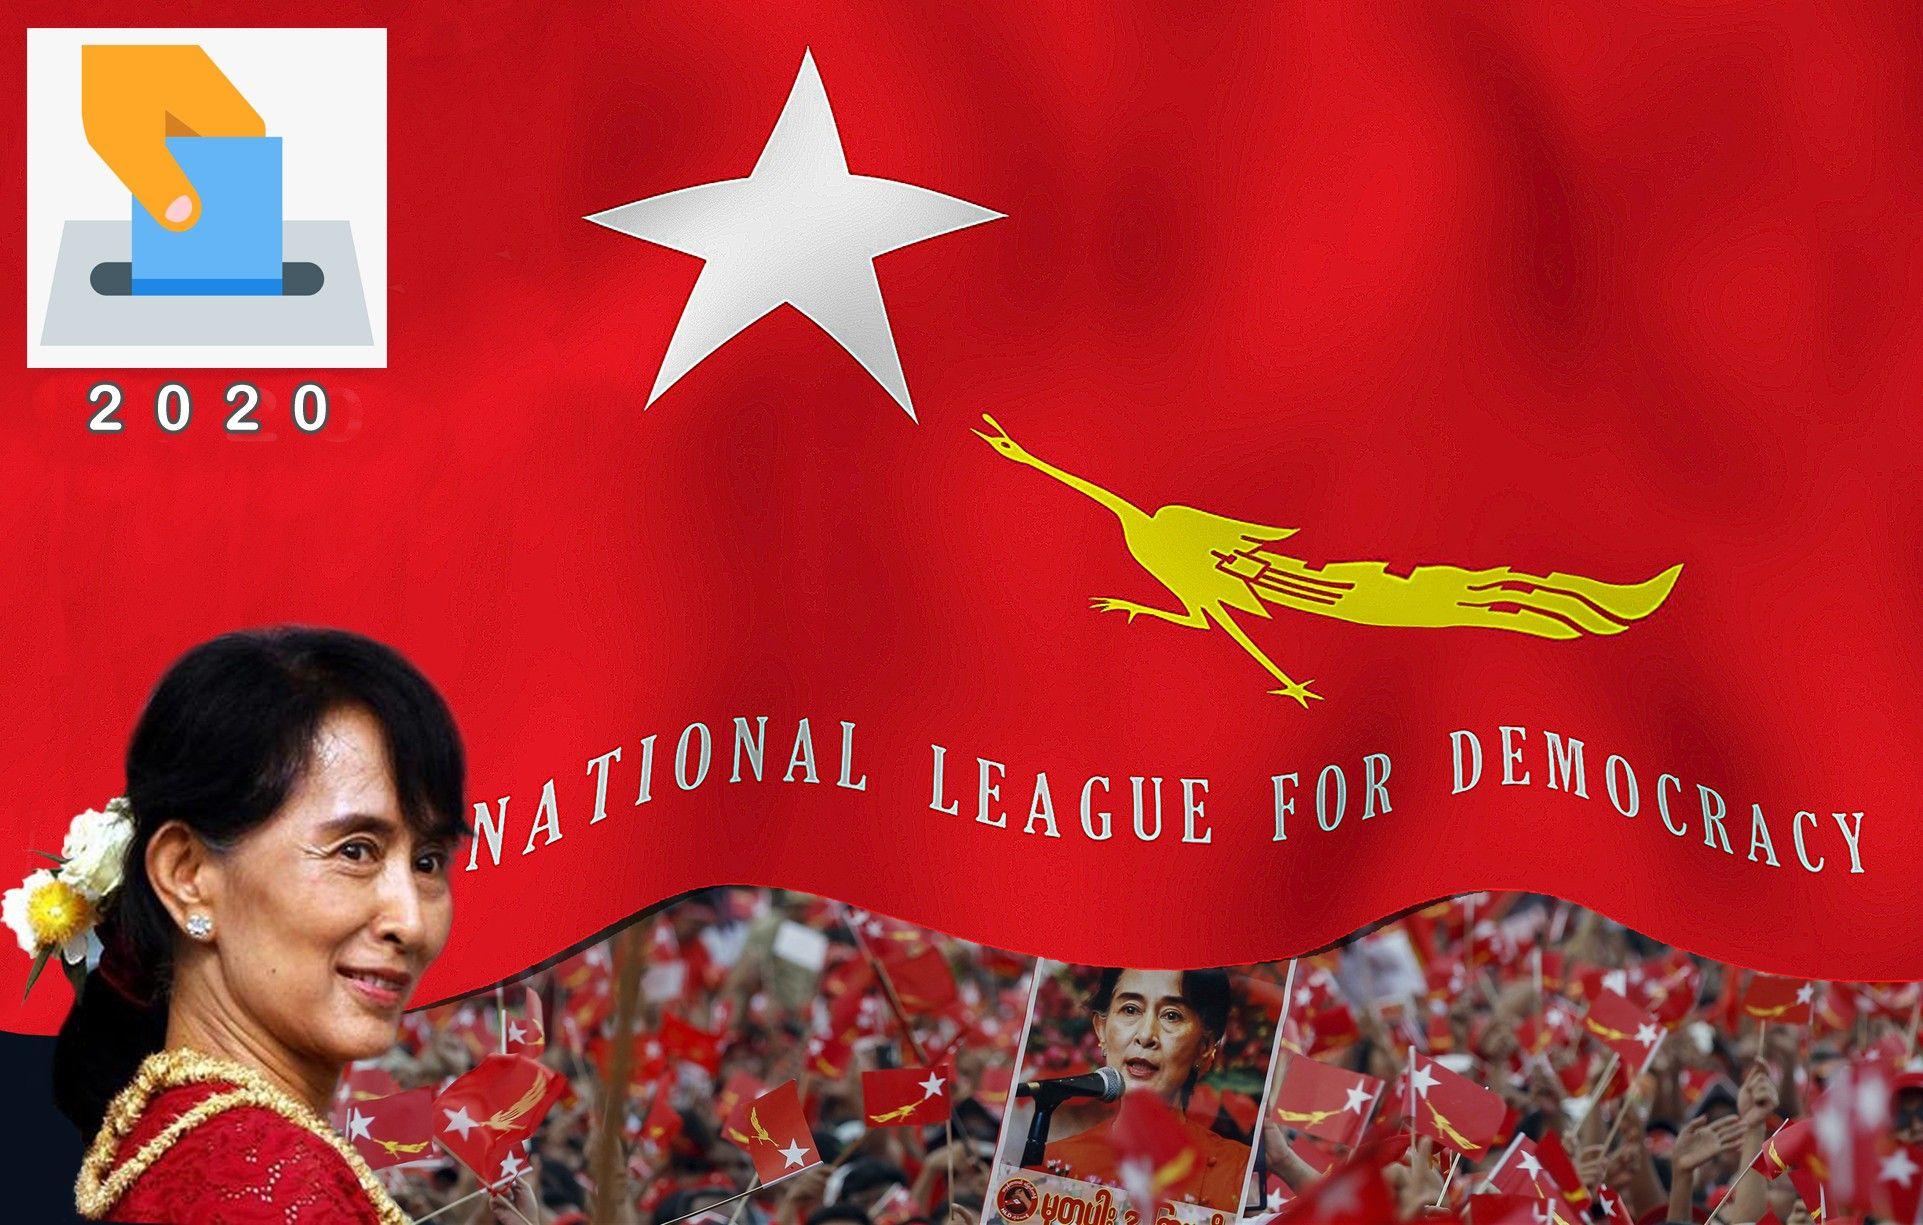 Pin by Aung Myo on daw aung san suu kyi in 2020   League, Save, San